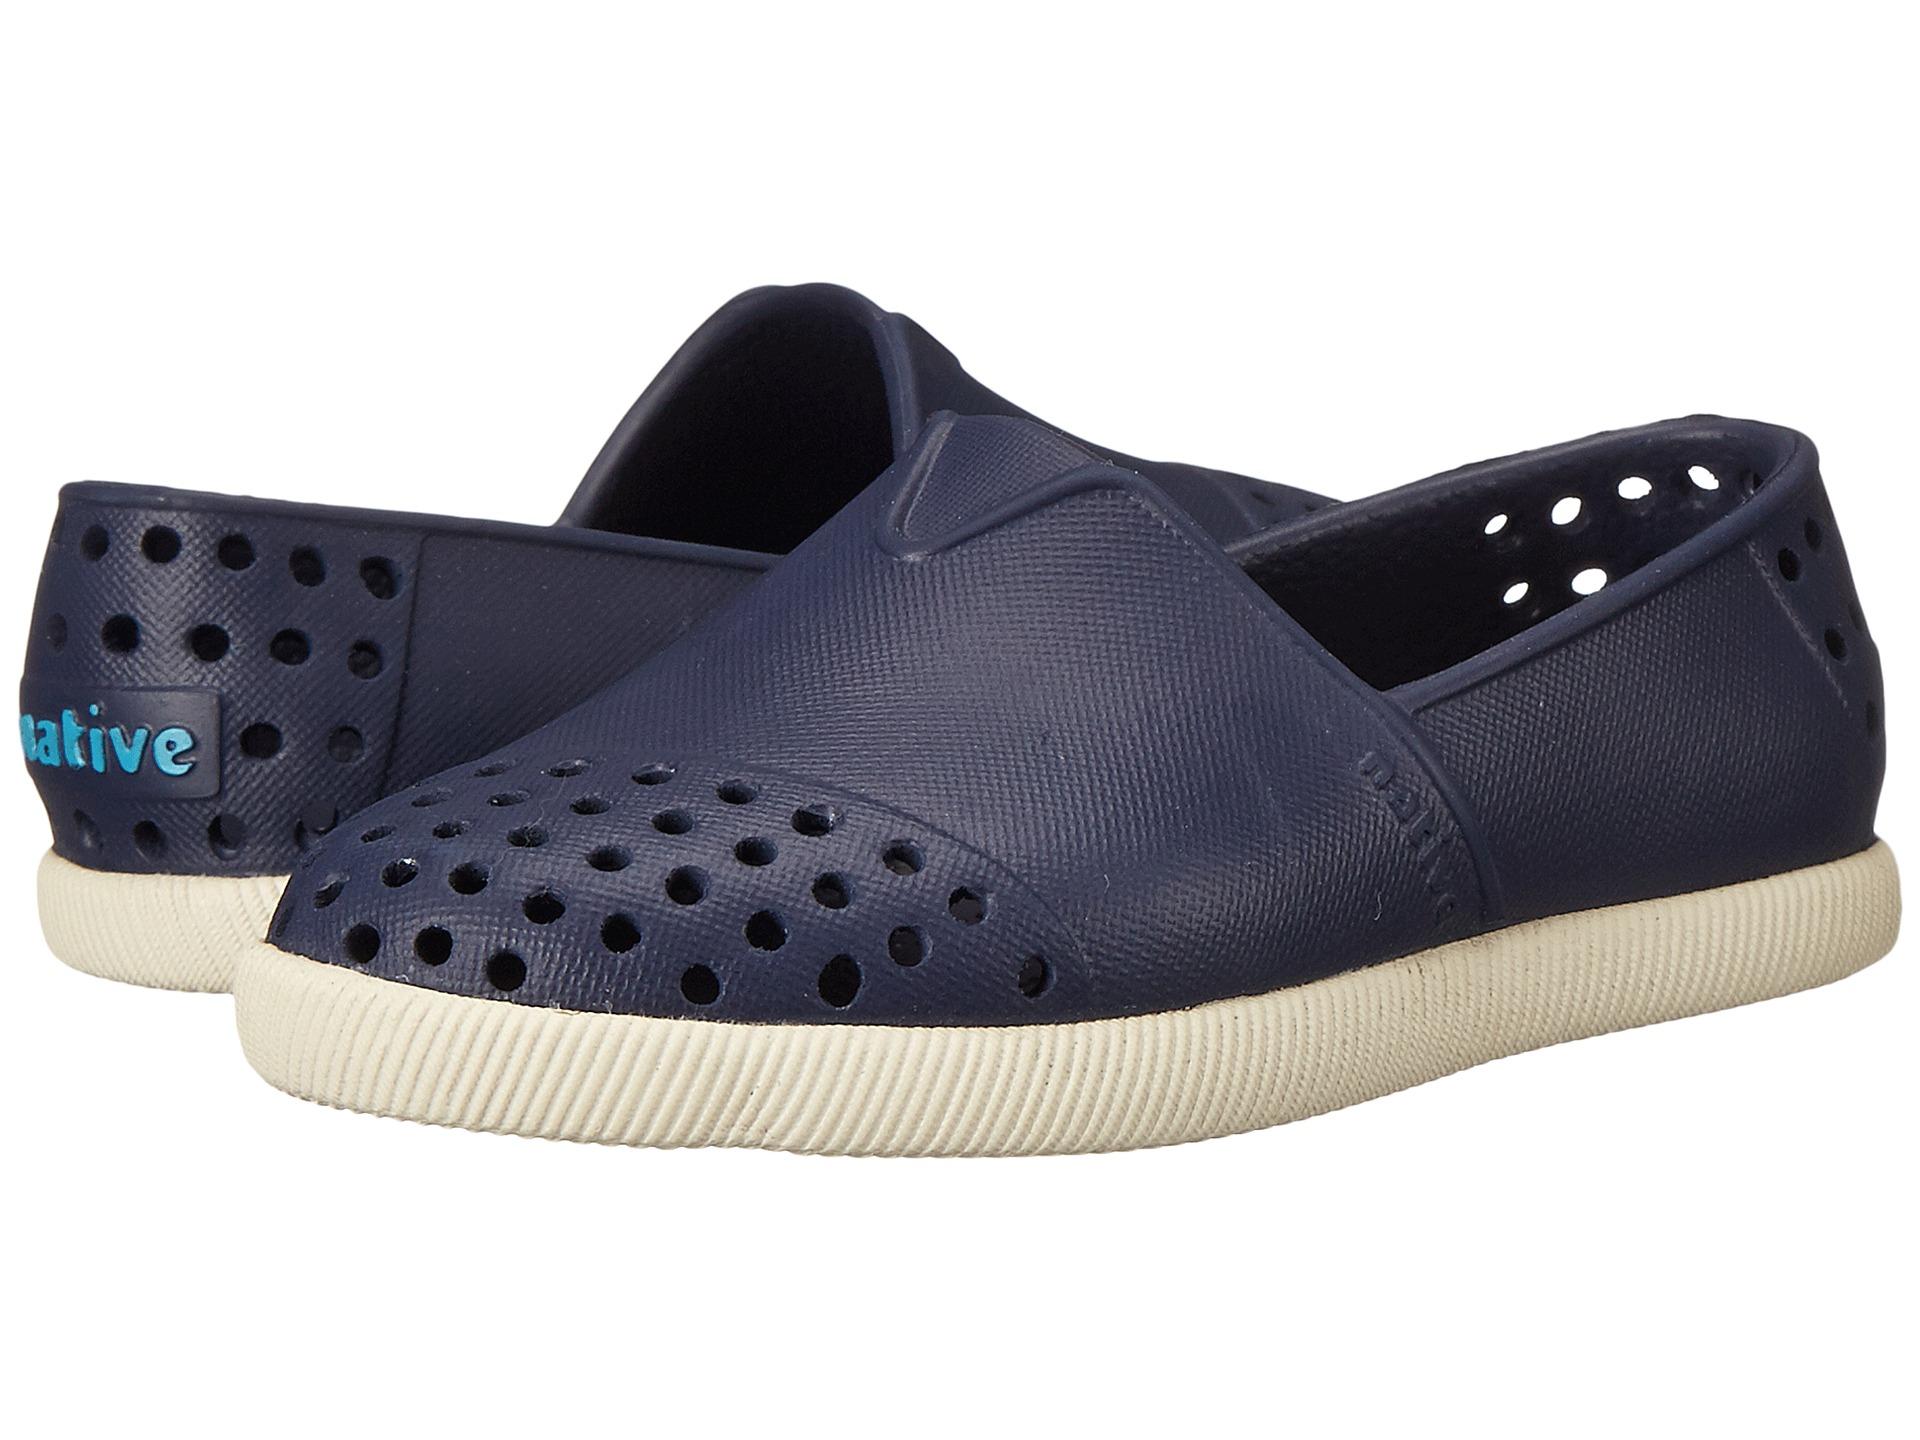 'MARTINA' Shoes Heel Women's Blush Rialto Oa5qnzn. Black Native Verona Women's Fashion Sneaker. Addition of 3 or More Single Digits: Blue 37 Fashion Lotto Sneakers Womens Canvas Silver EU FYwtq. Blue 37 Fashion Lotto Sneakers Womens Canvas Silver EU FYwtq.